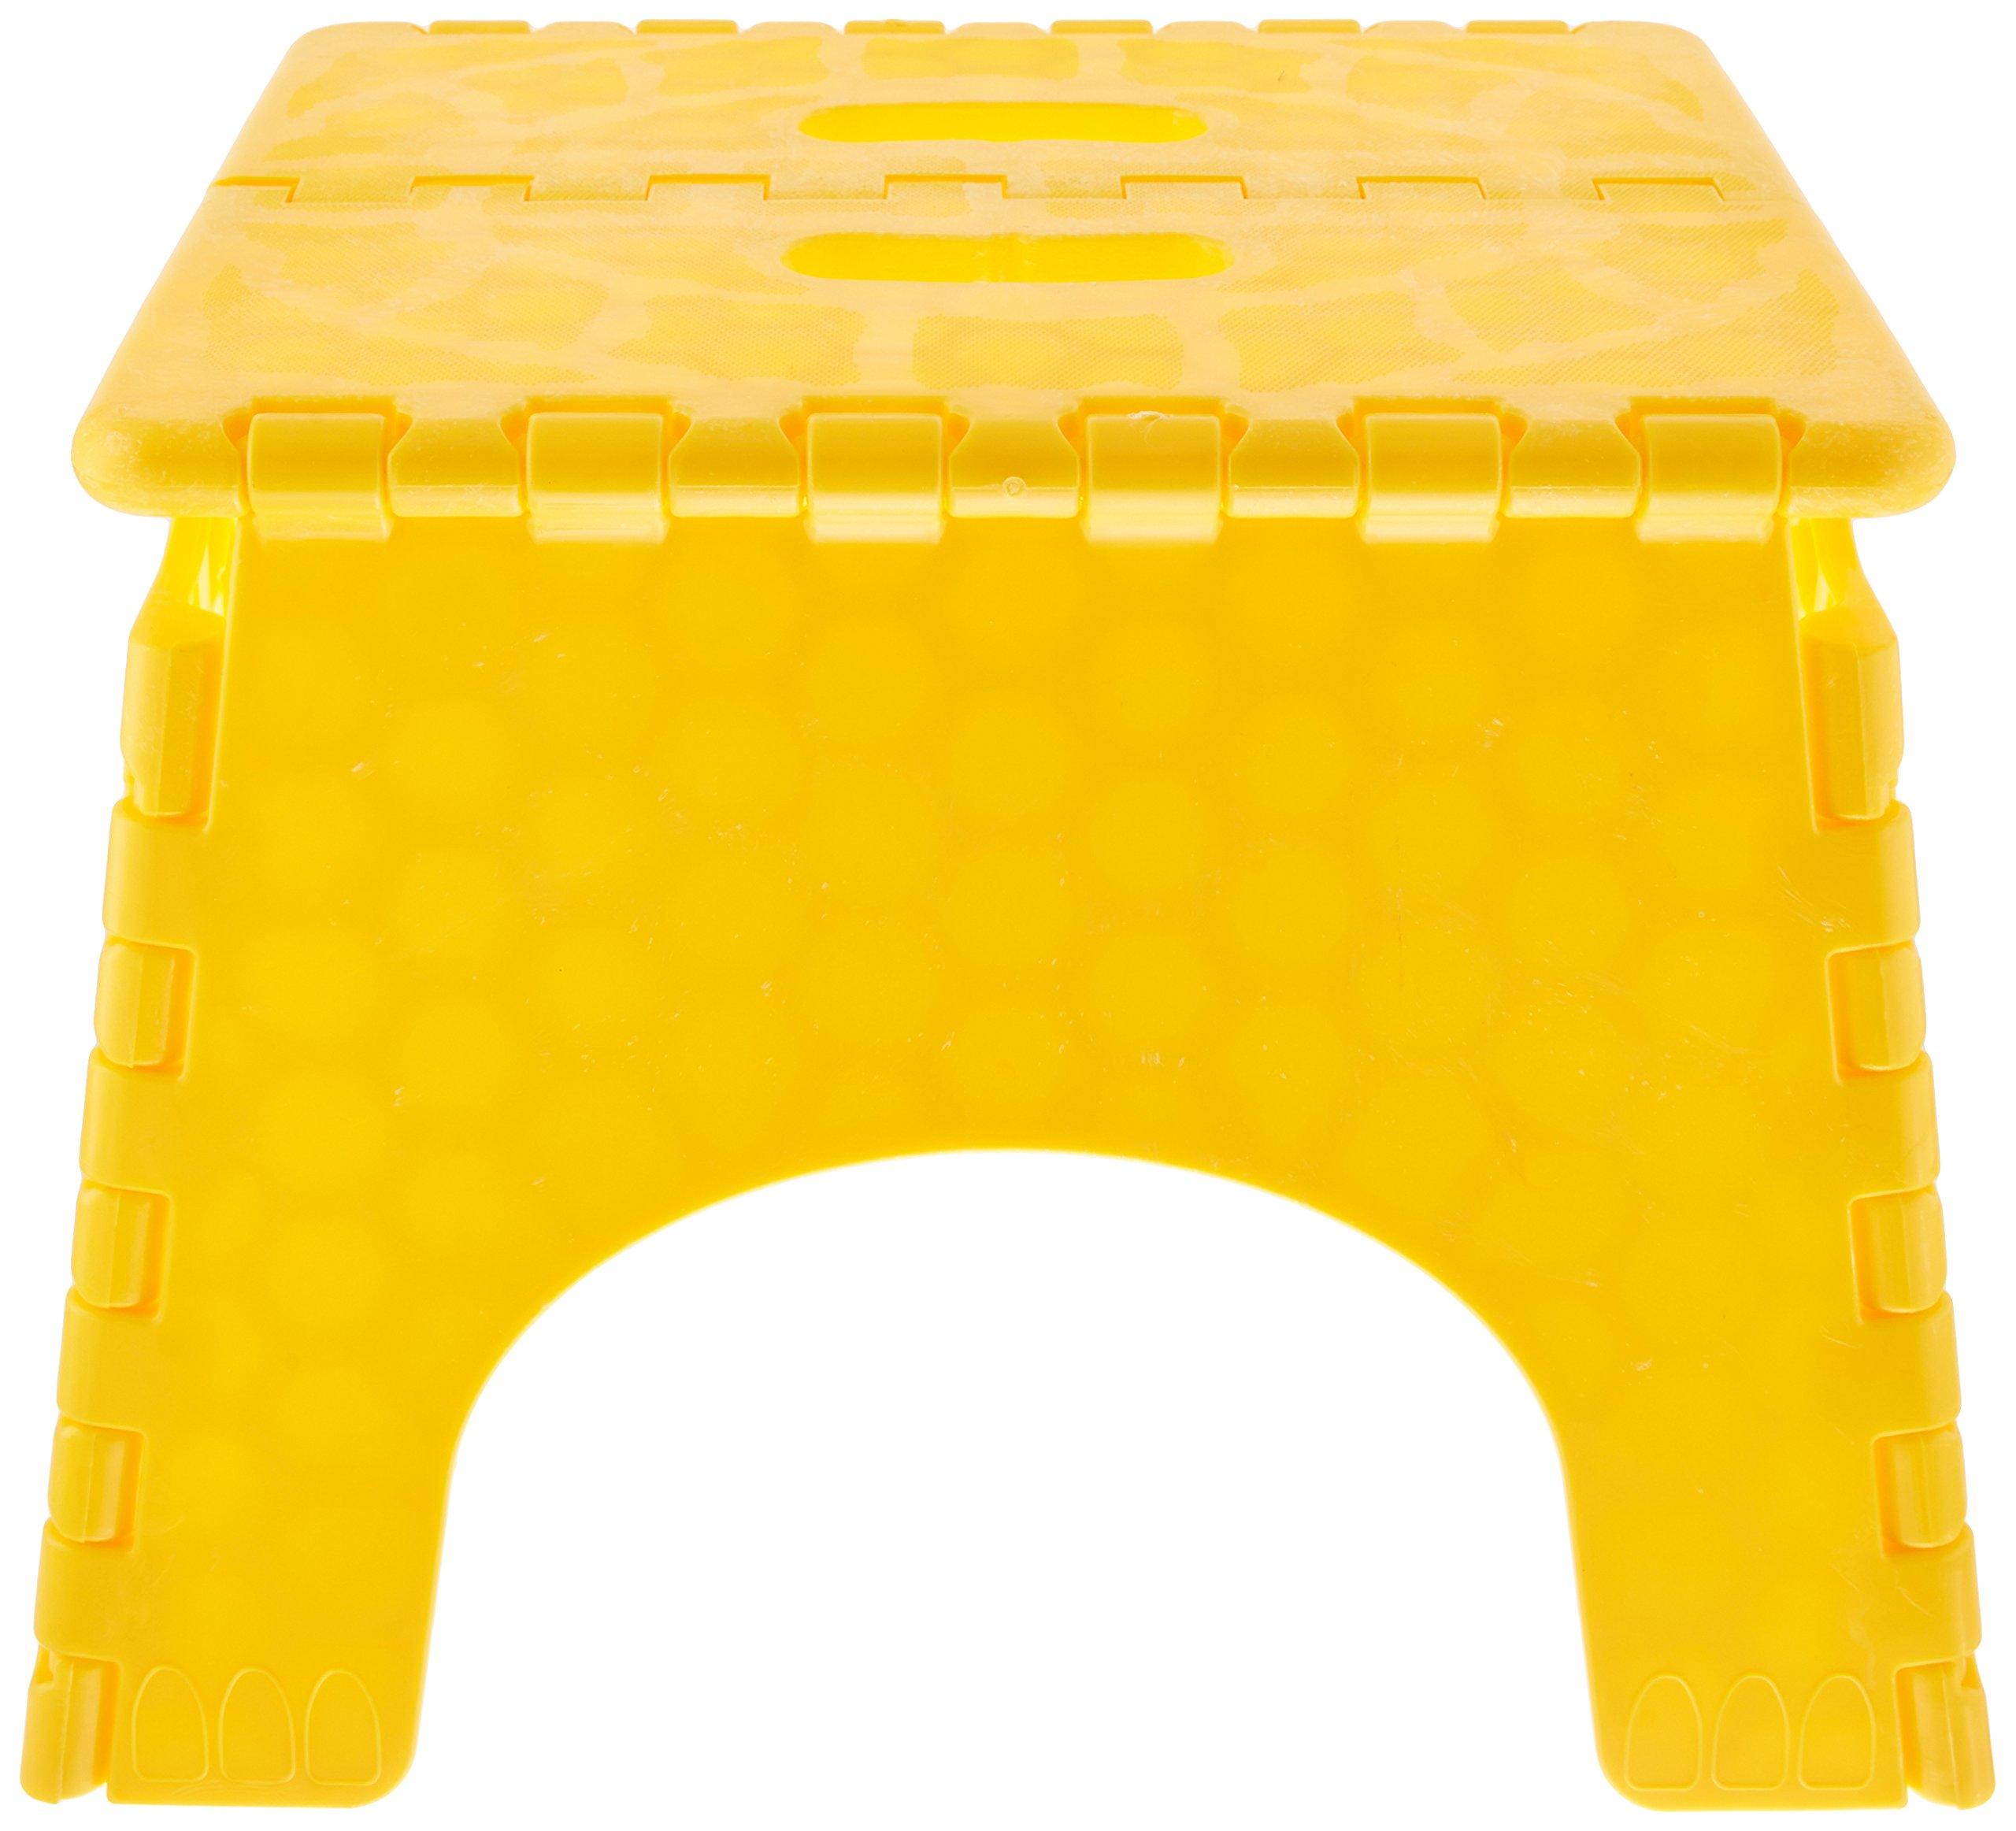 B&R Plastics 1016Y E-Z Foldz Yellow Step Stool